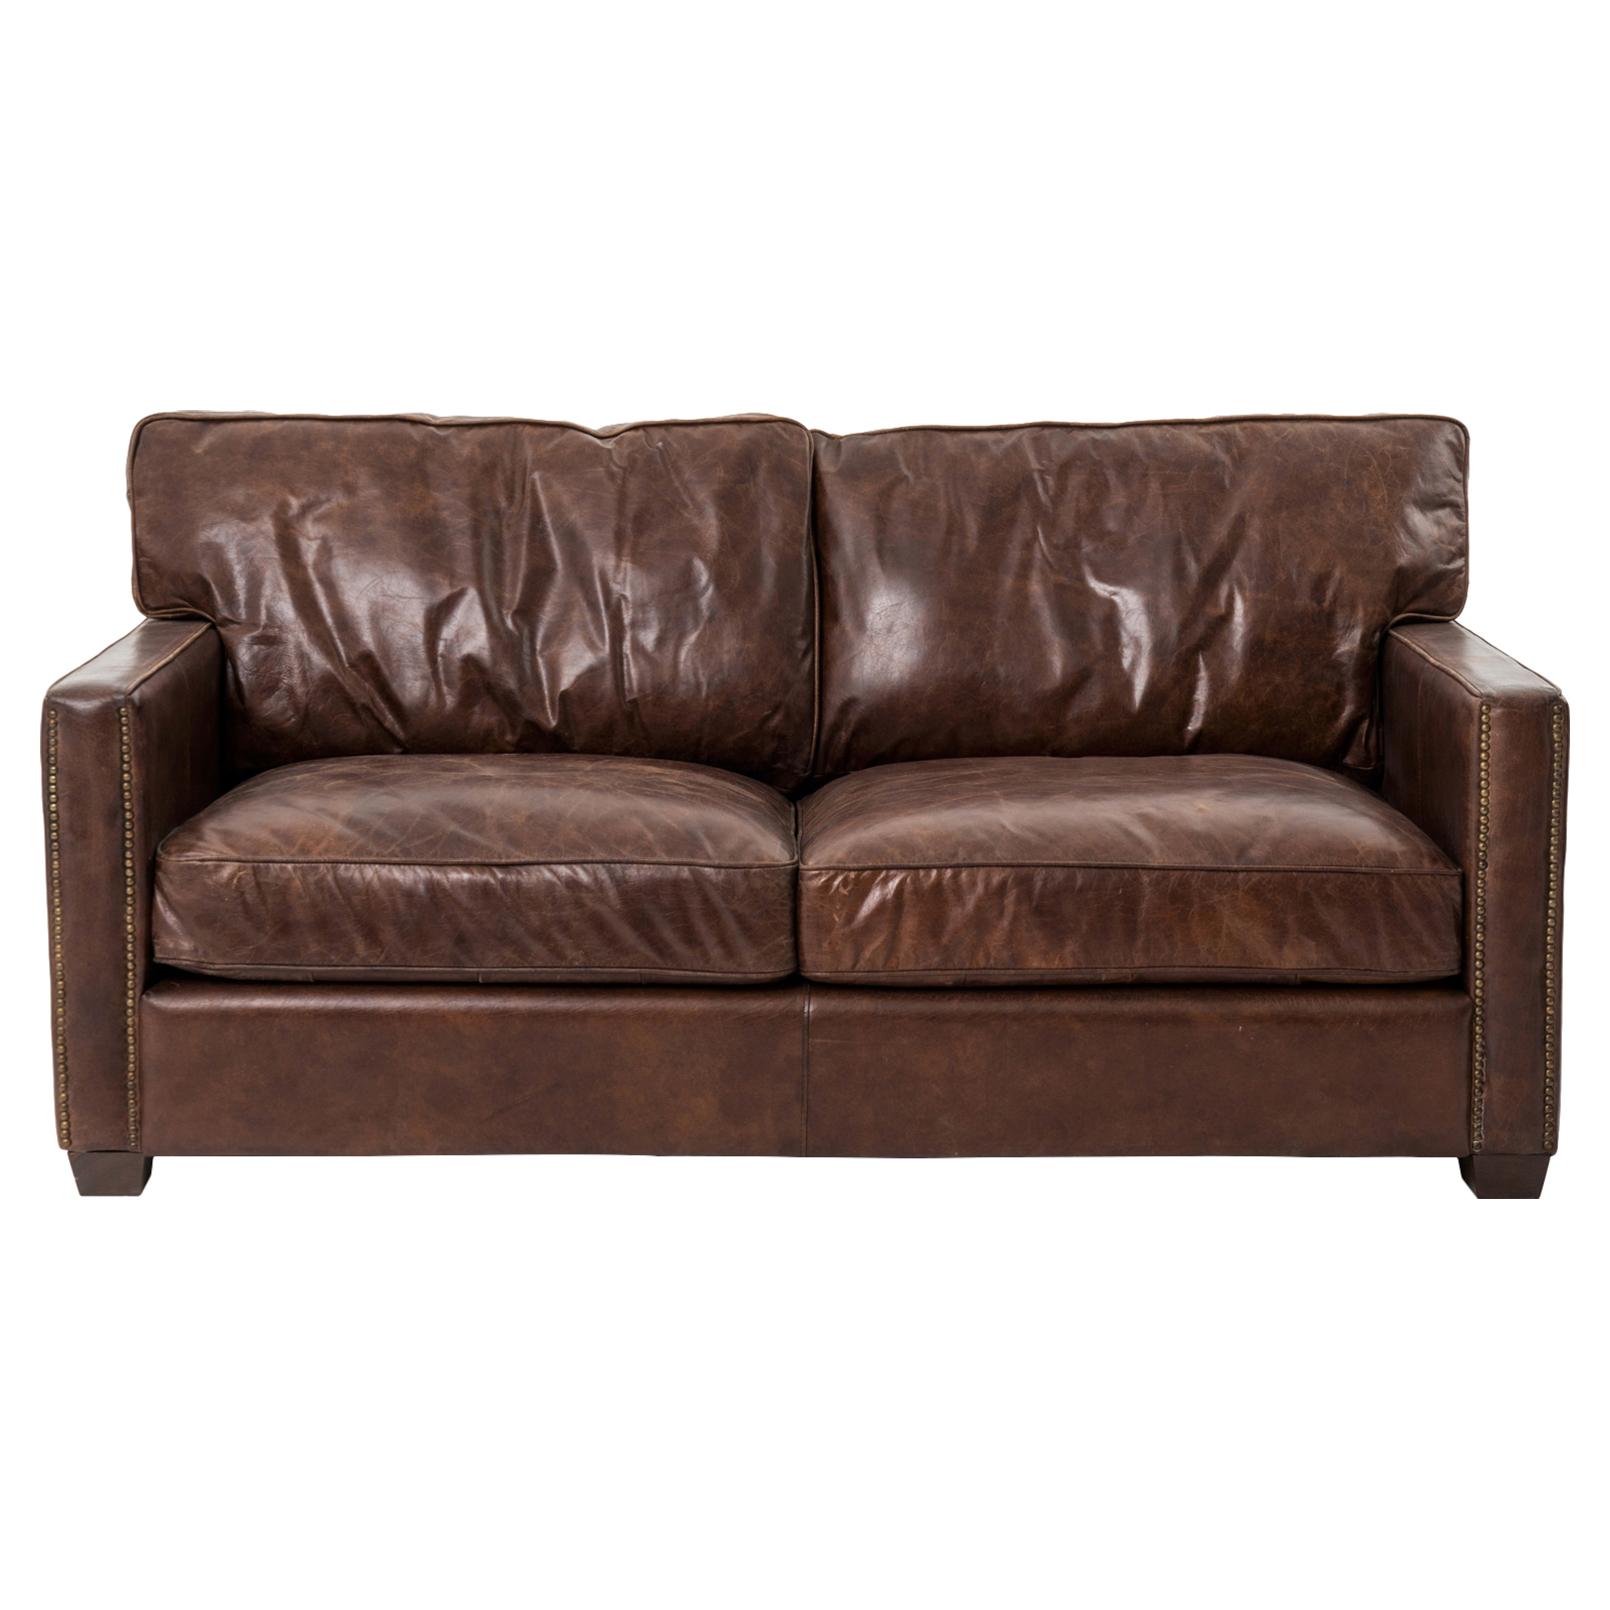 Setter Rustic Lodge Antique Brass Nailhead Trim Brown Leather Cushion Back Sofa